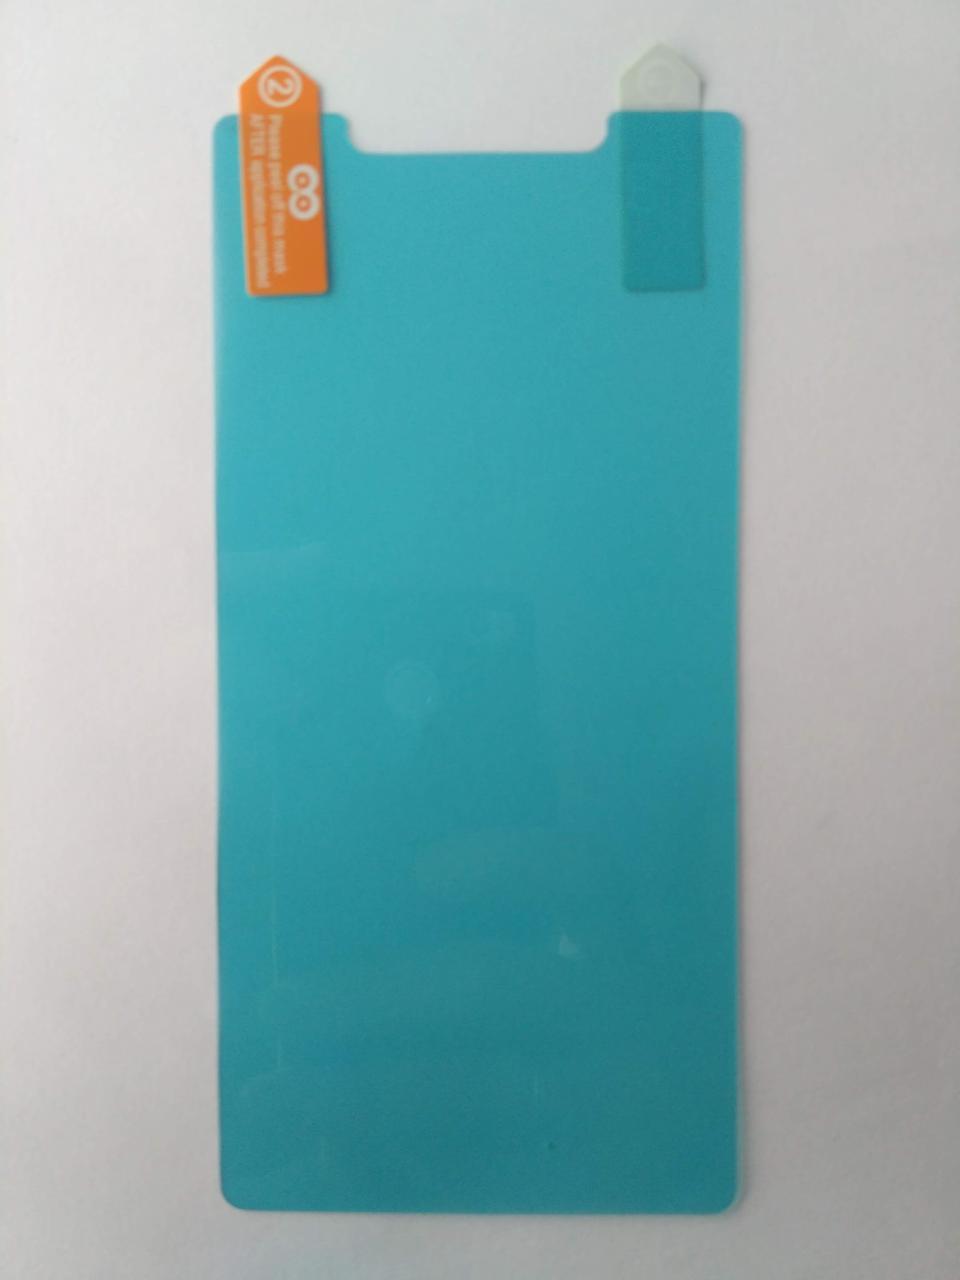 Ударопрочная пленка Xiaomi Black Shark глянцевая